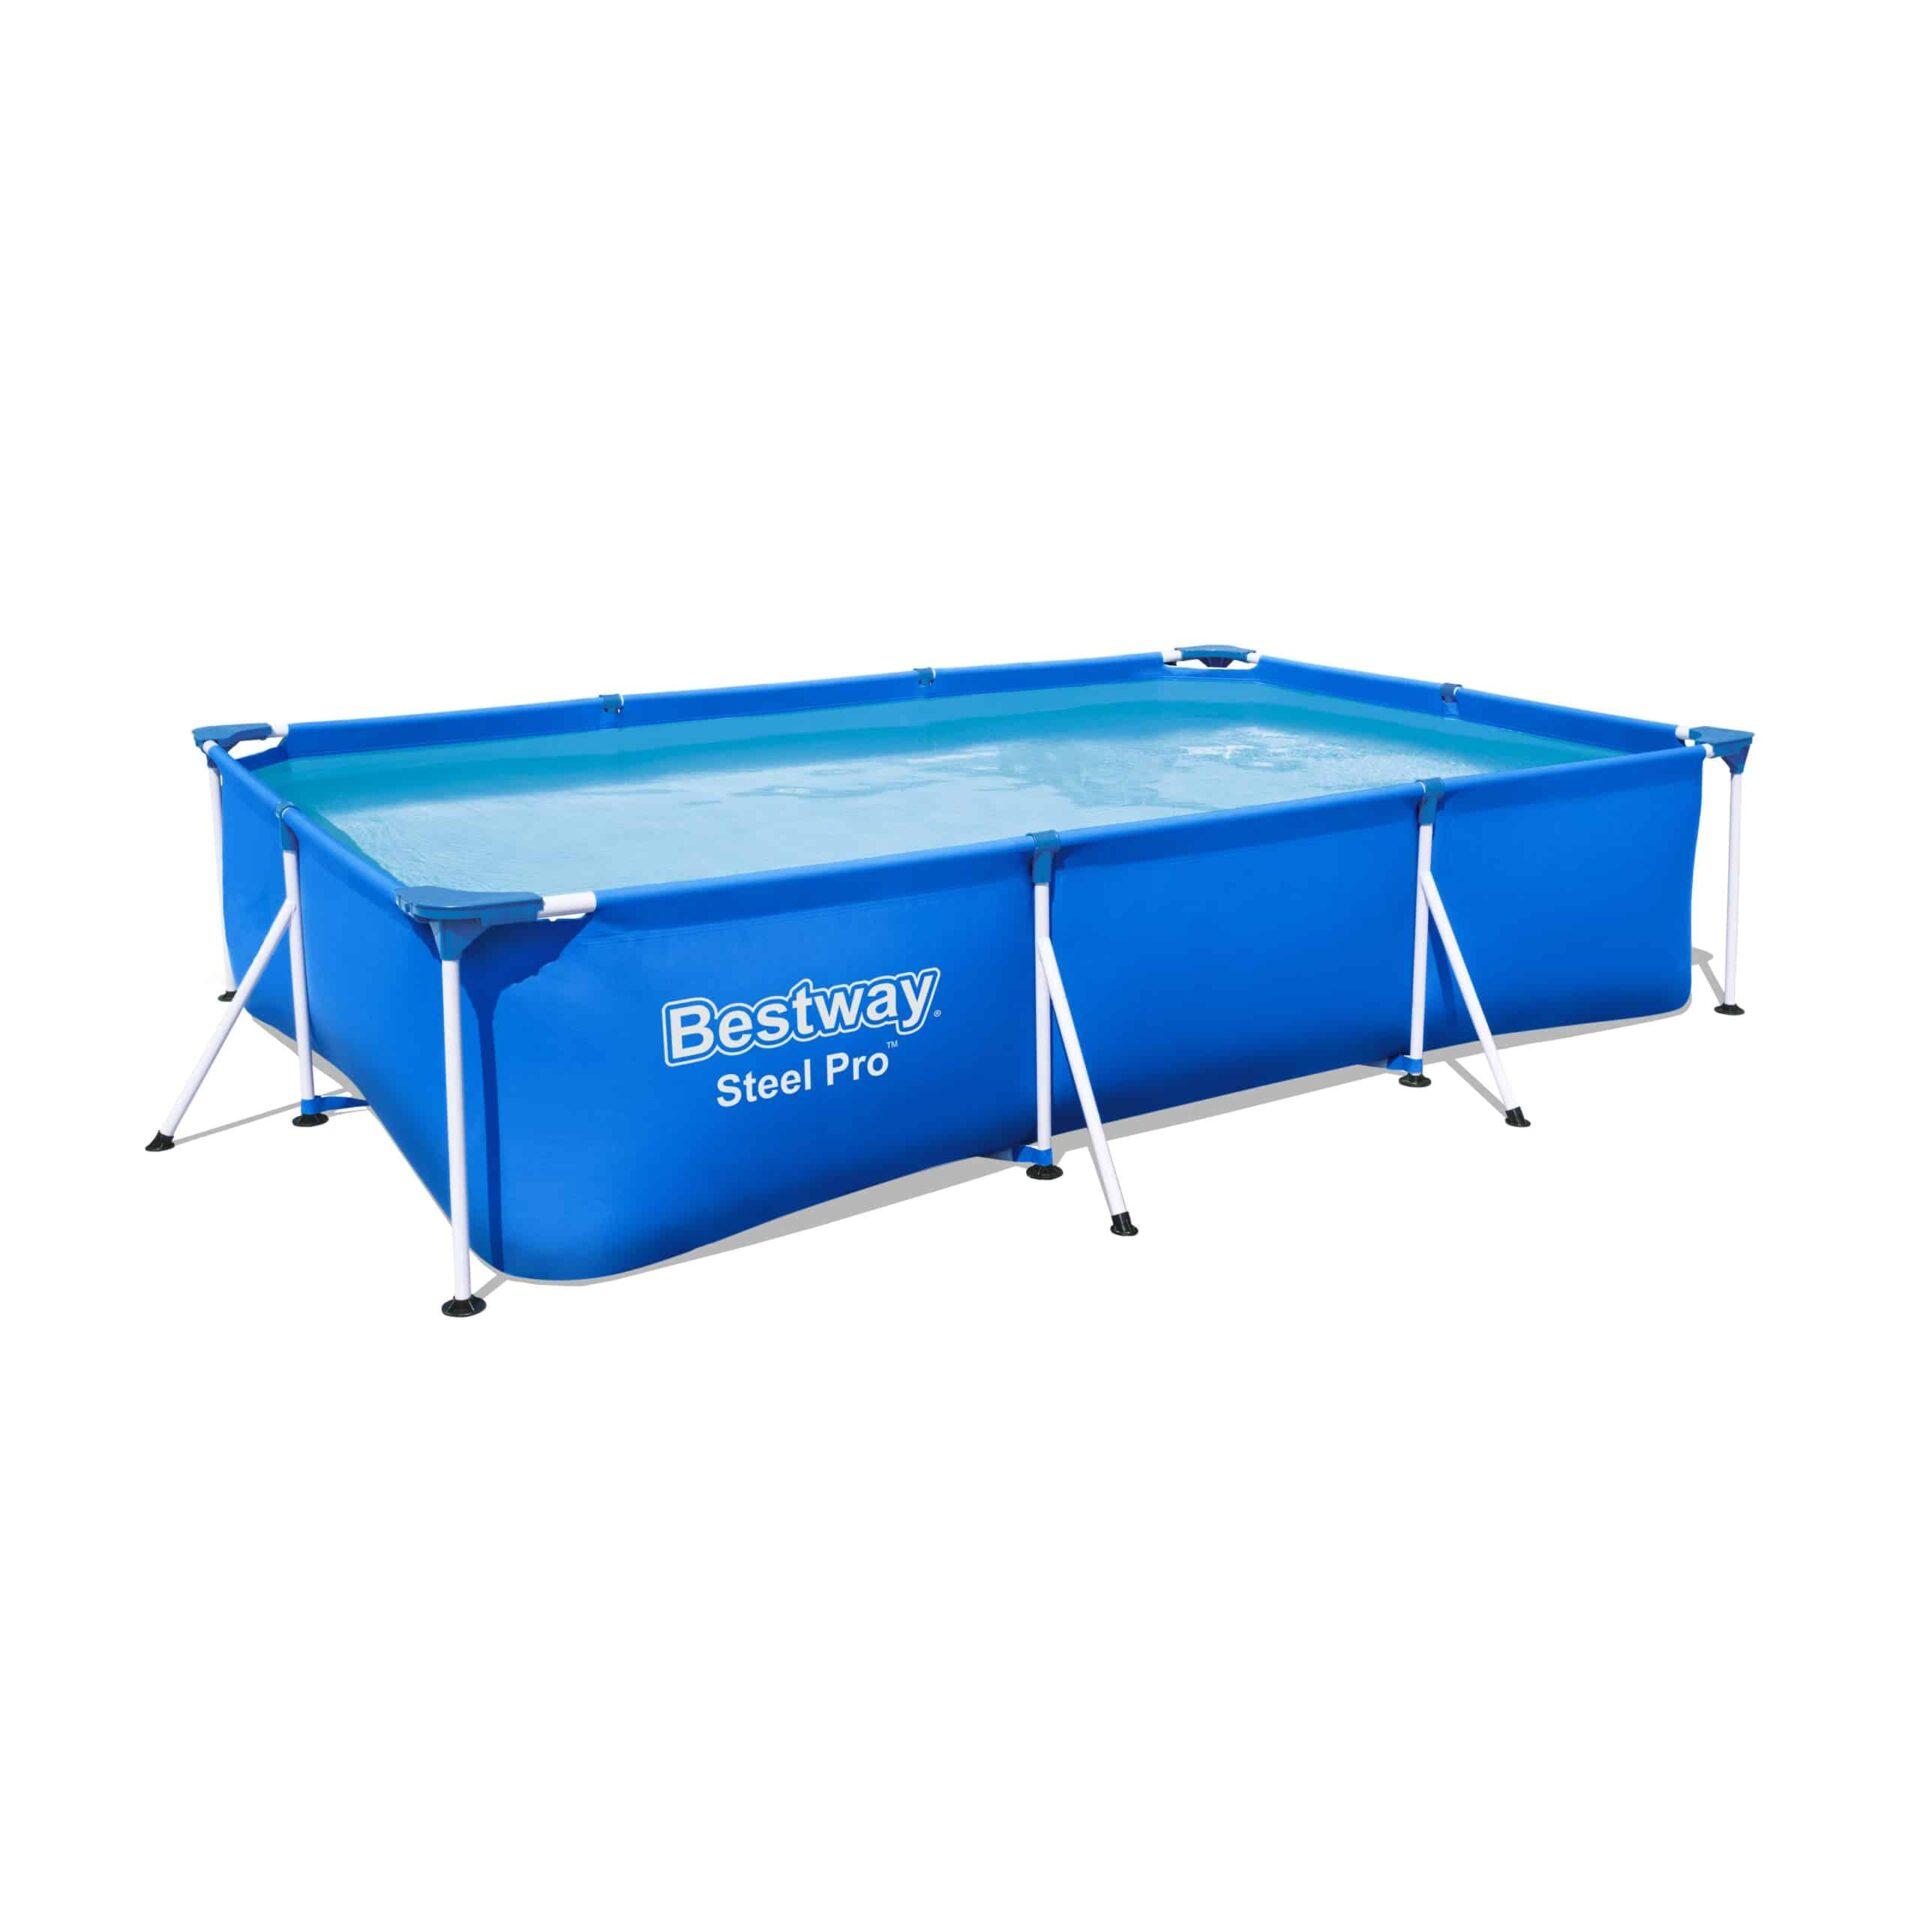 Rektangulaert-Power-Steel-basseng-Bestway